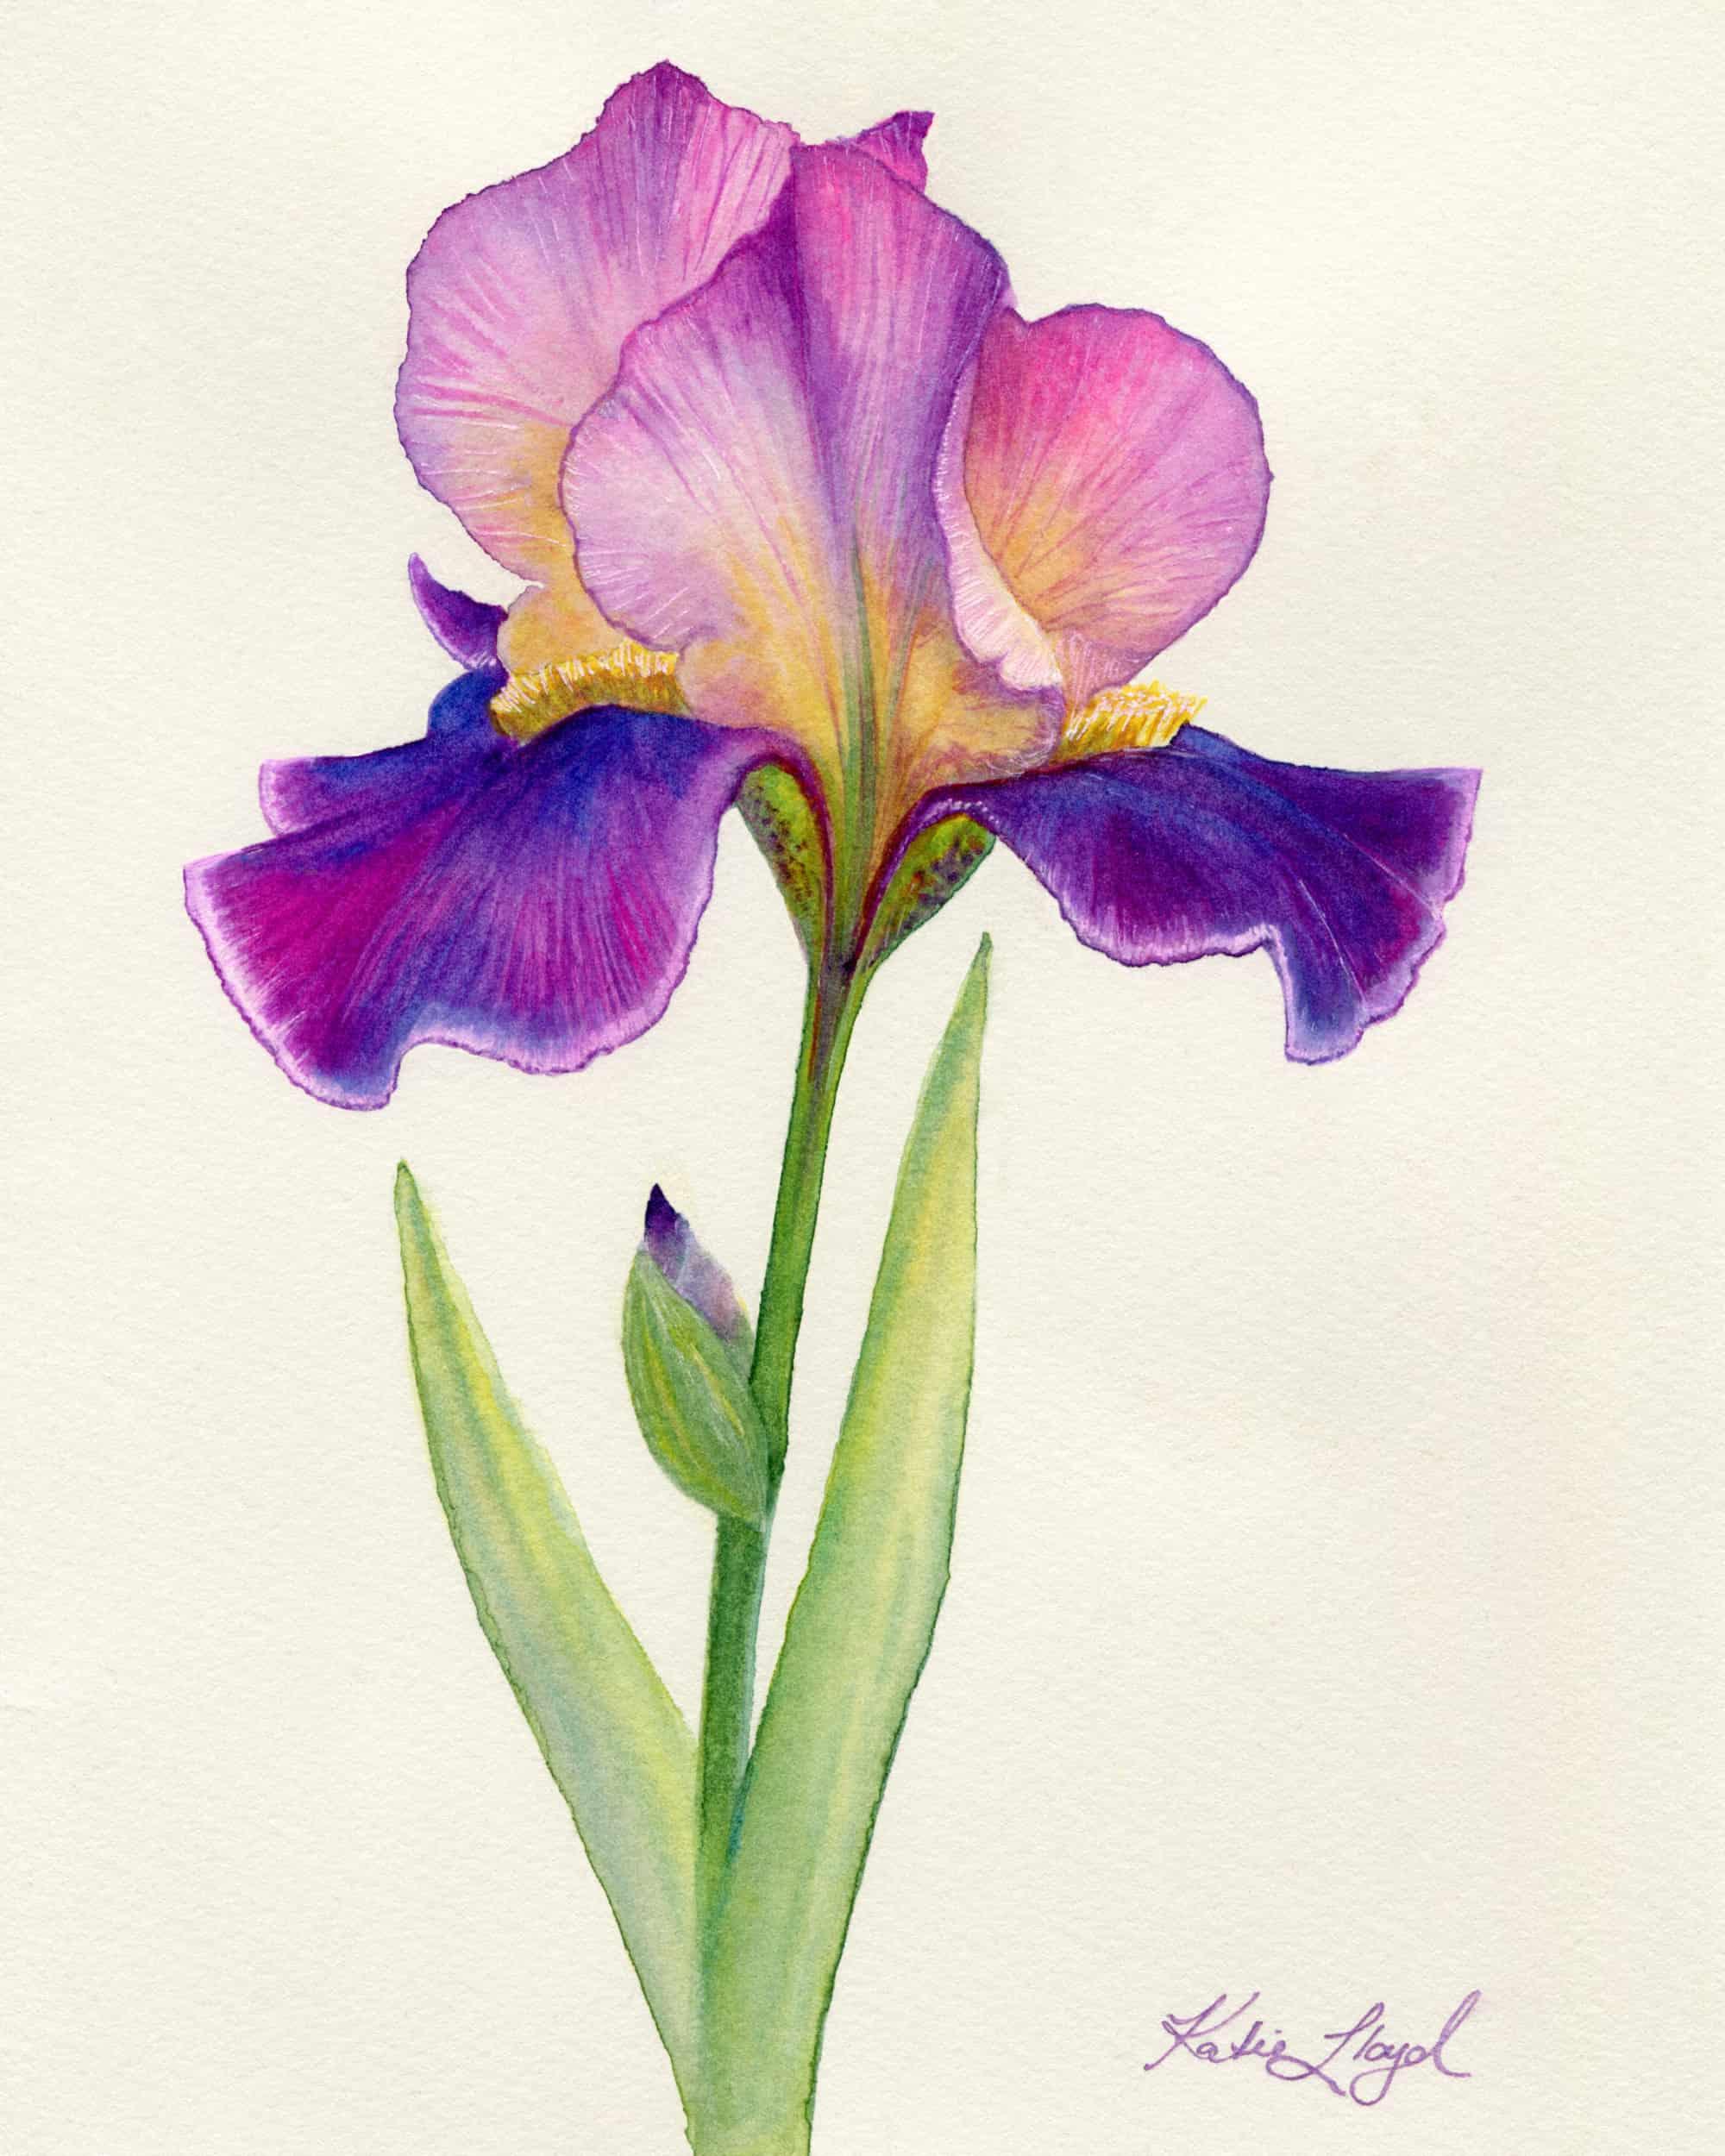 Pink and purple Iris flower